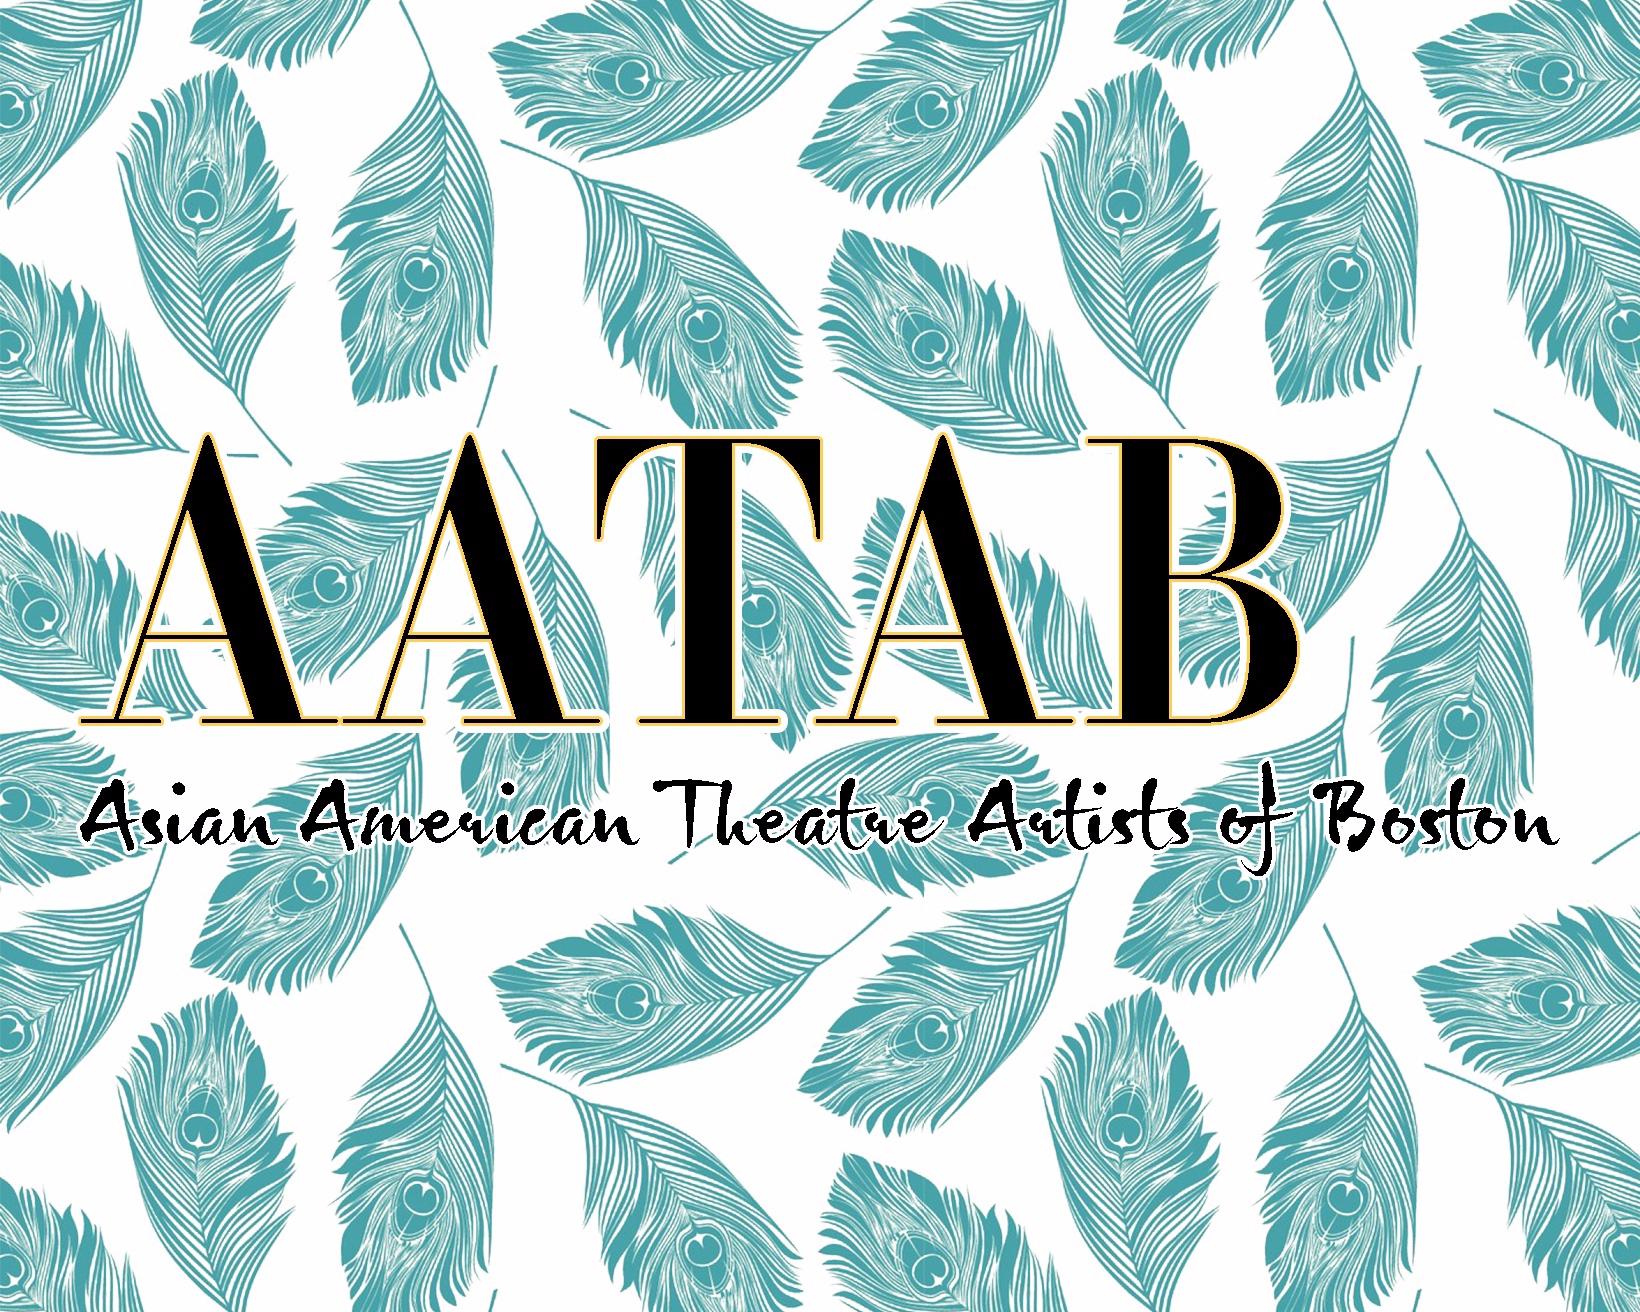 AATAB%2Bfull%2Bsquare.jpg